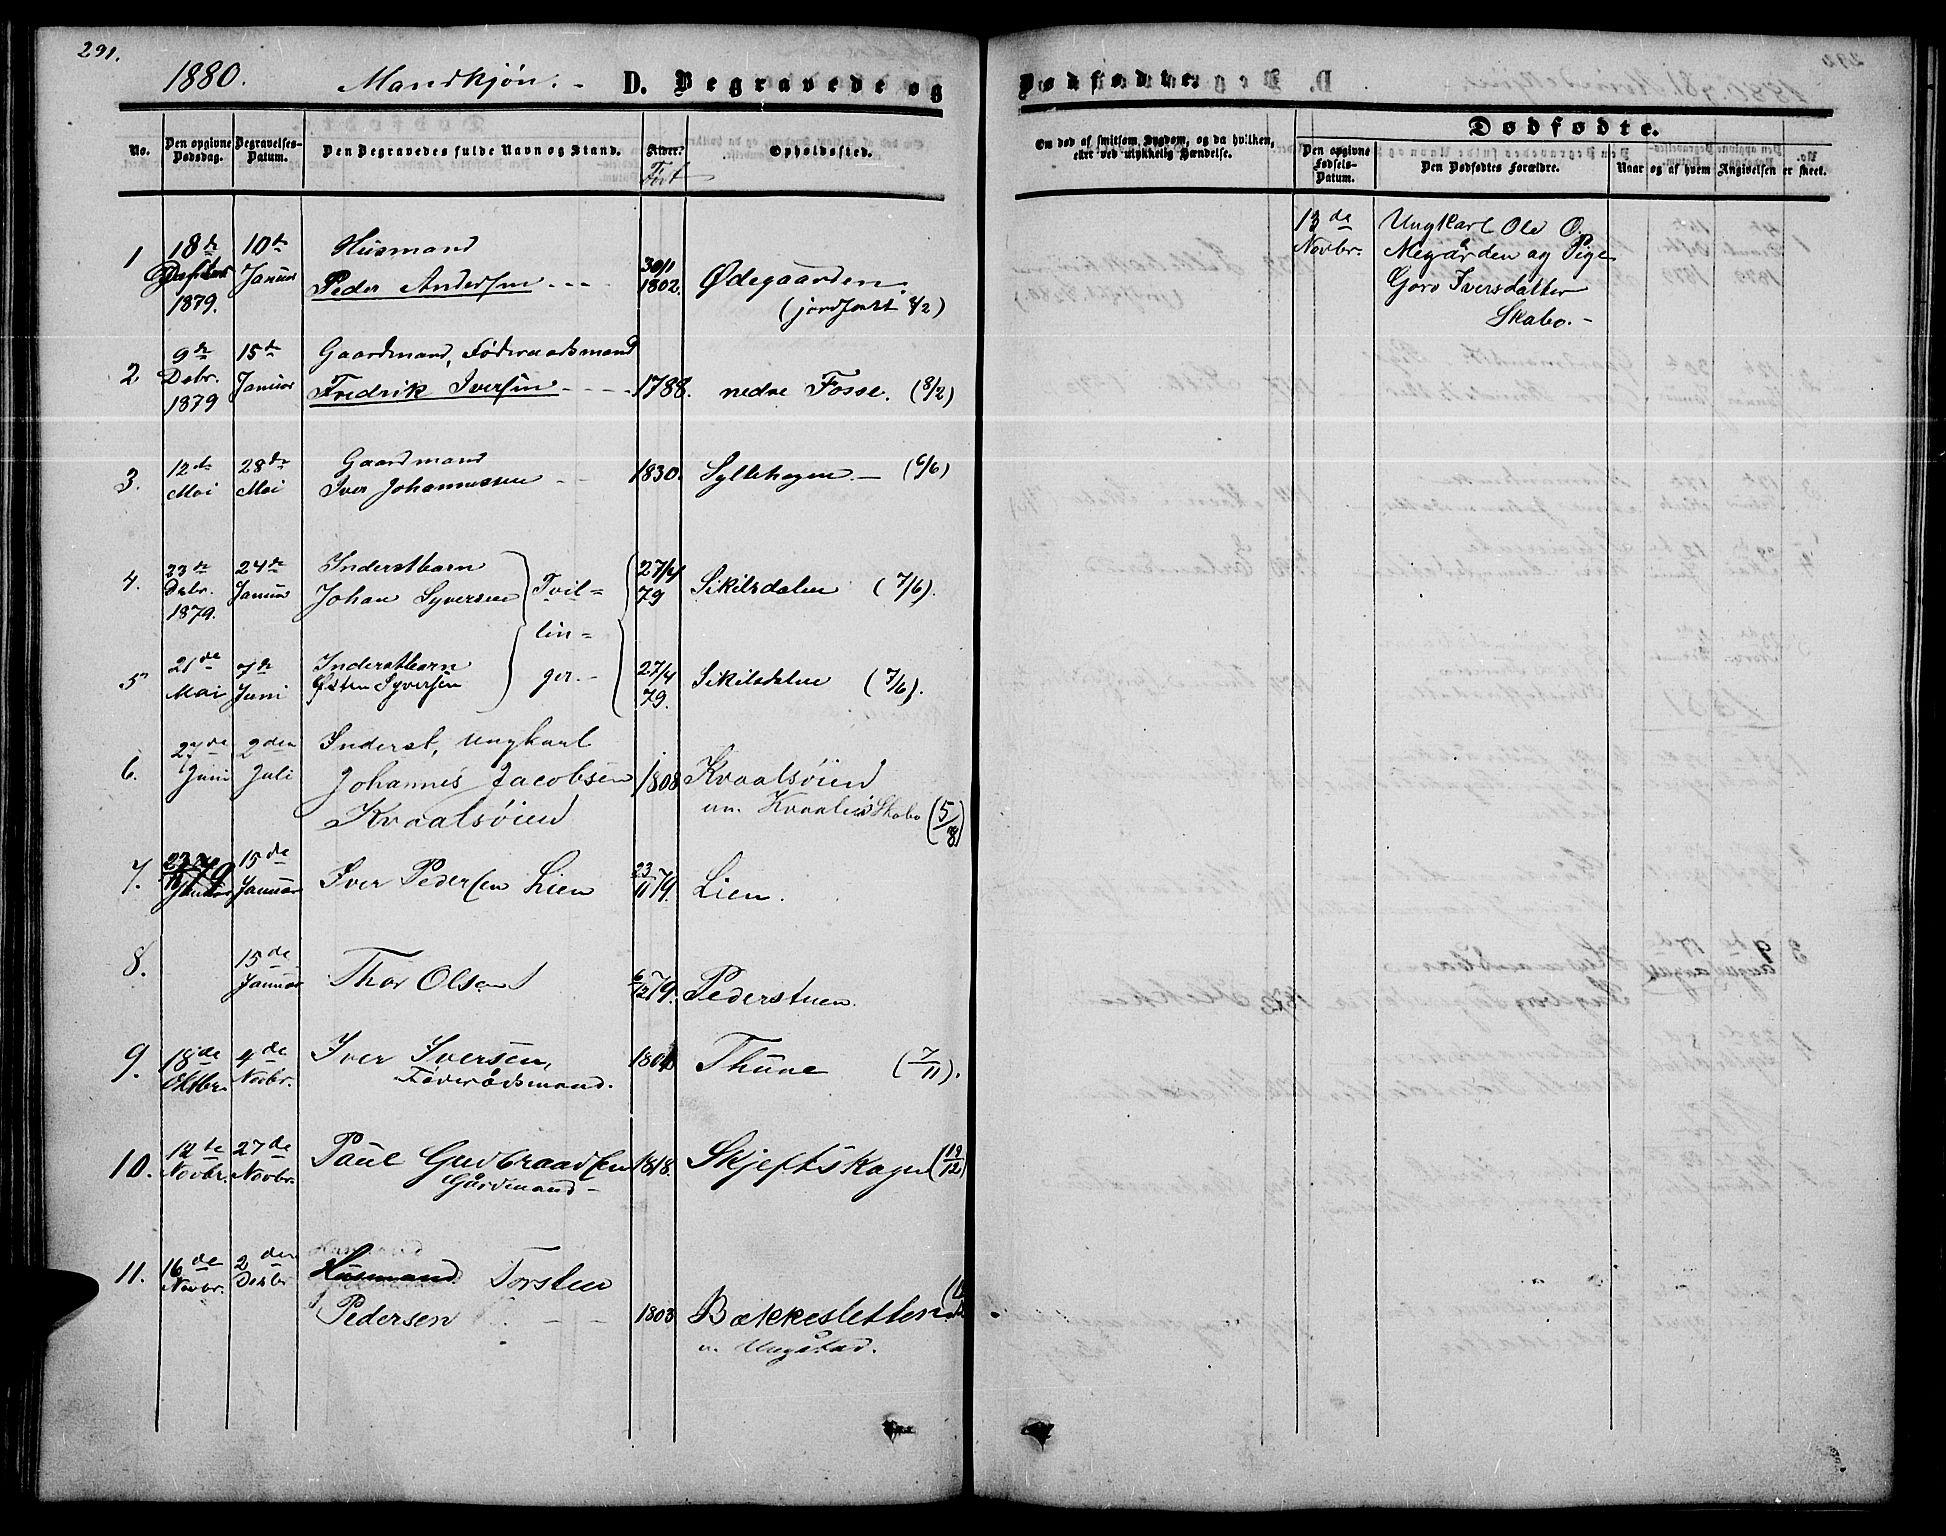 SAH, Nord-Fron prestekontor, Klokkerbok nr. 2, 1851-1883, s. 291